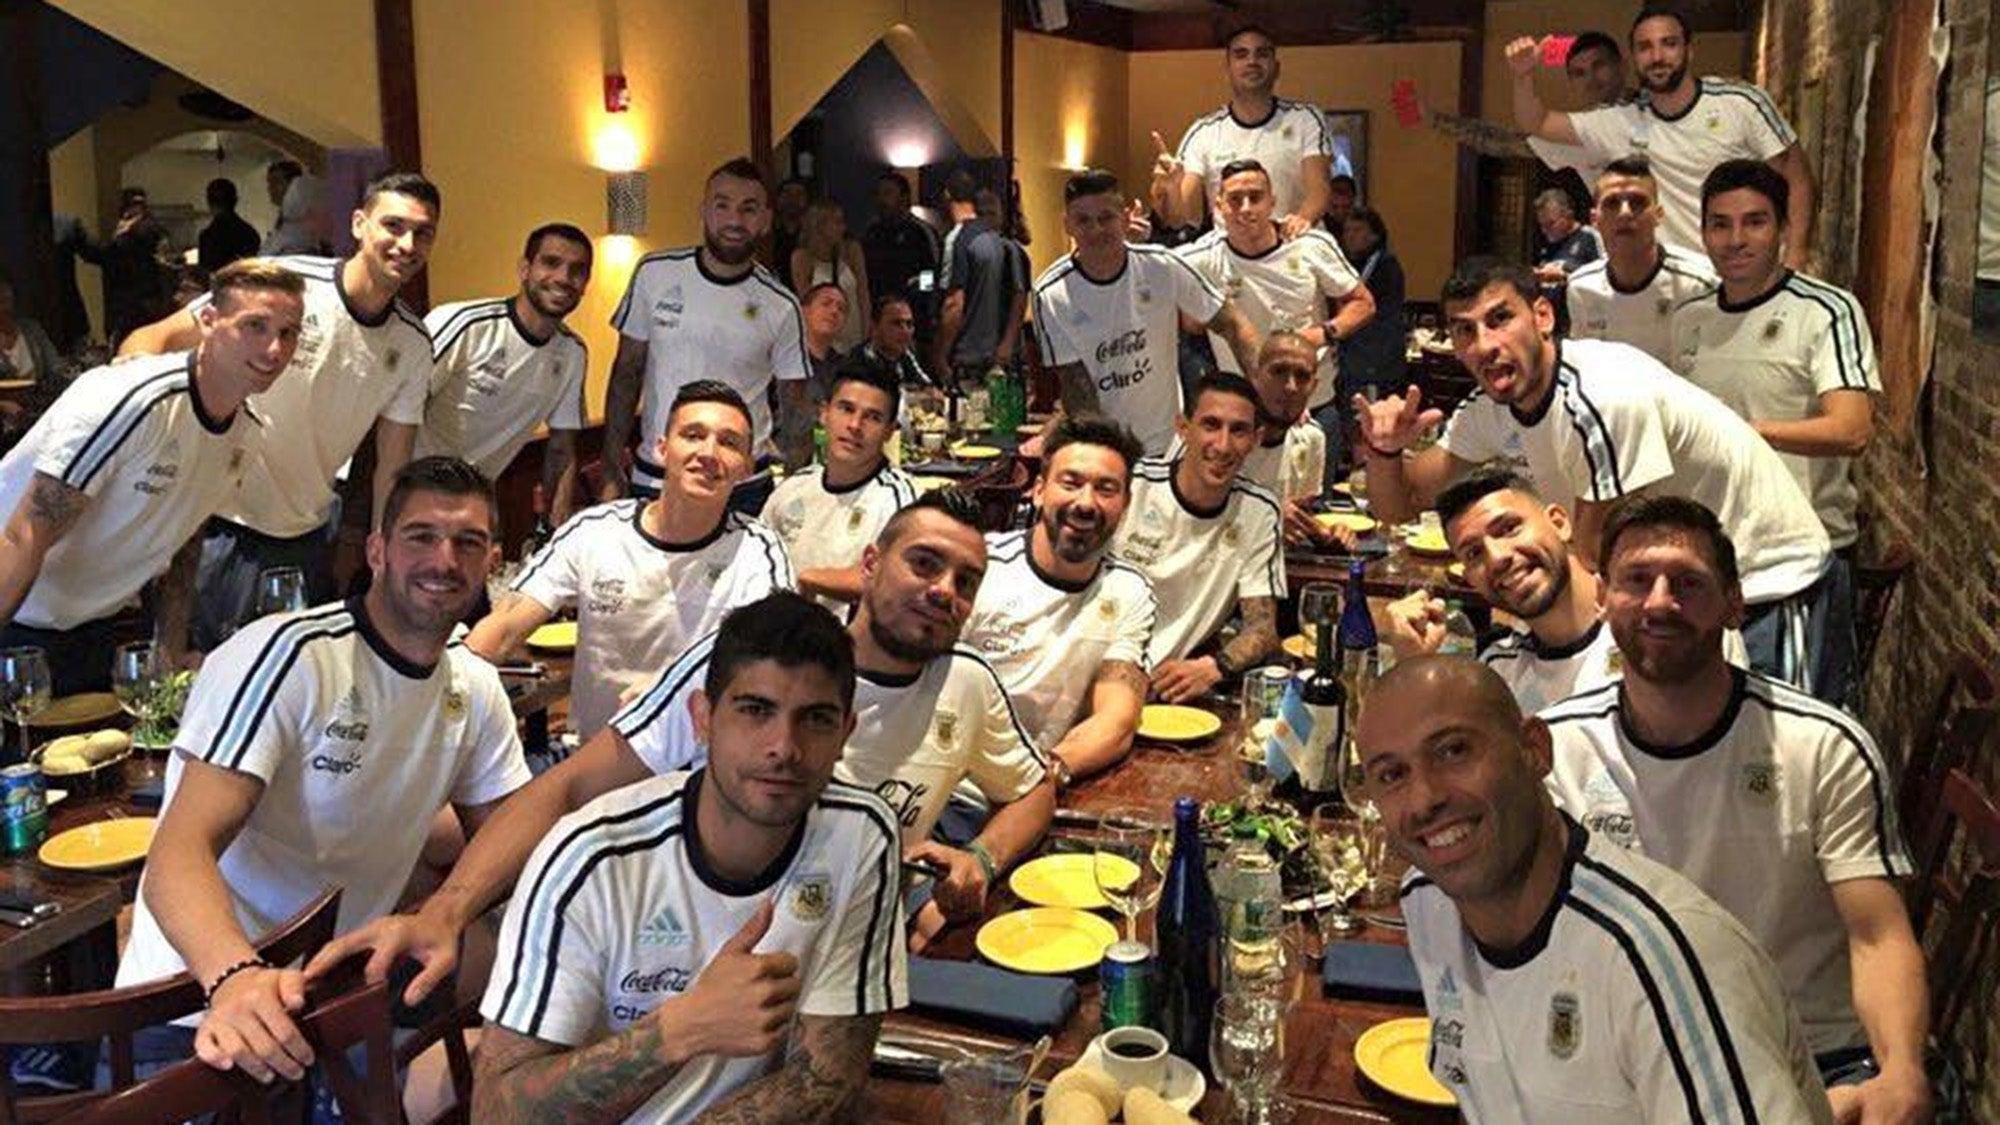 Argentina's soccer team ate at Tango Restaurant